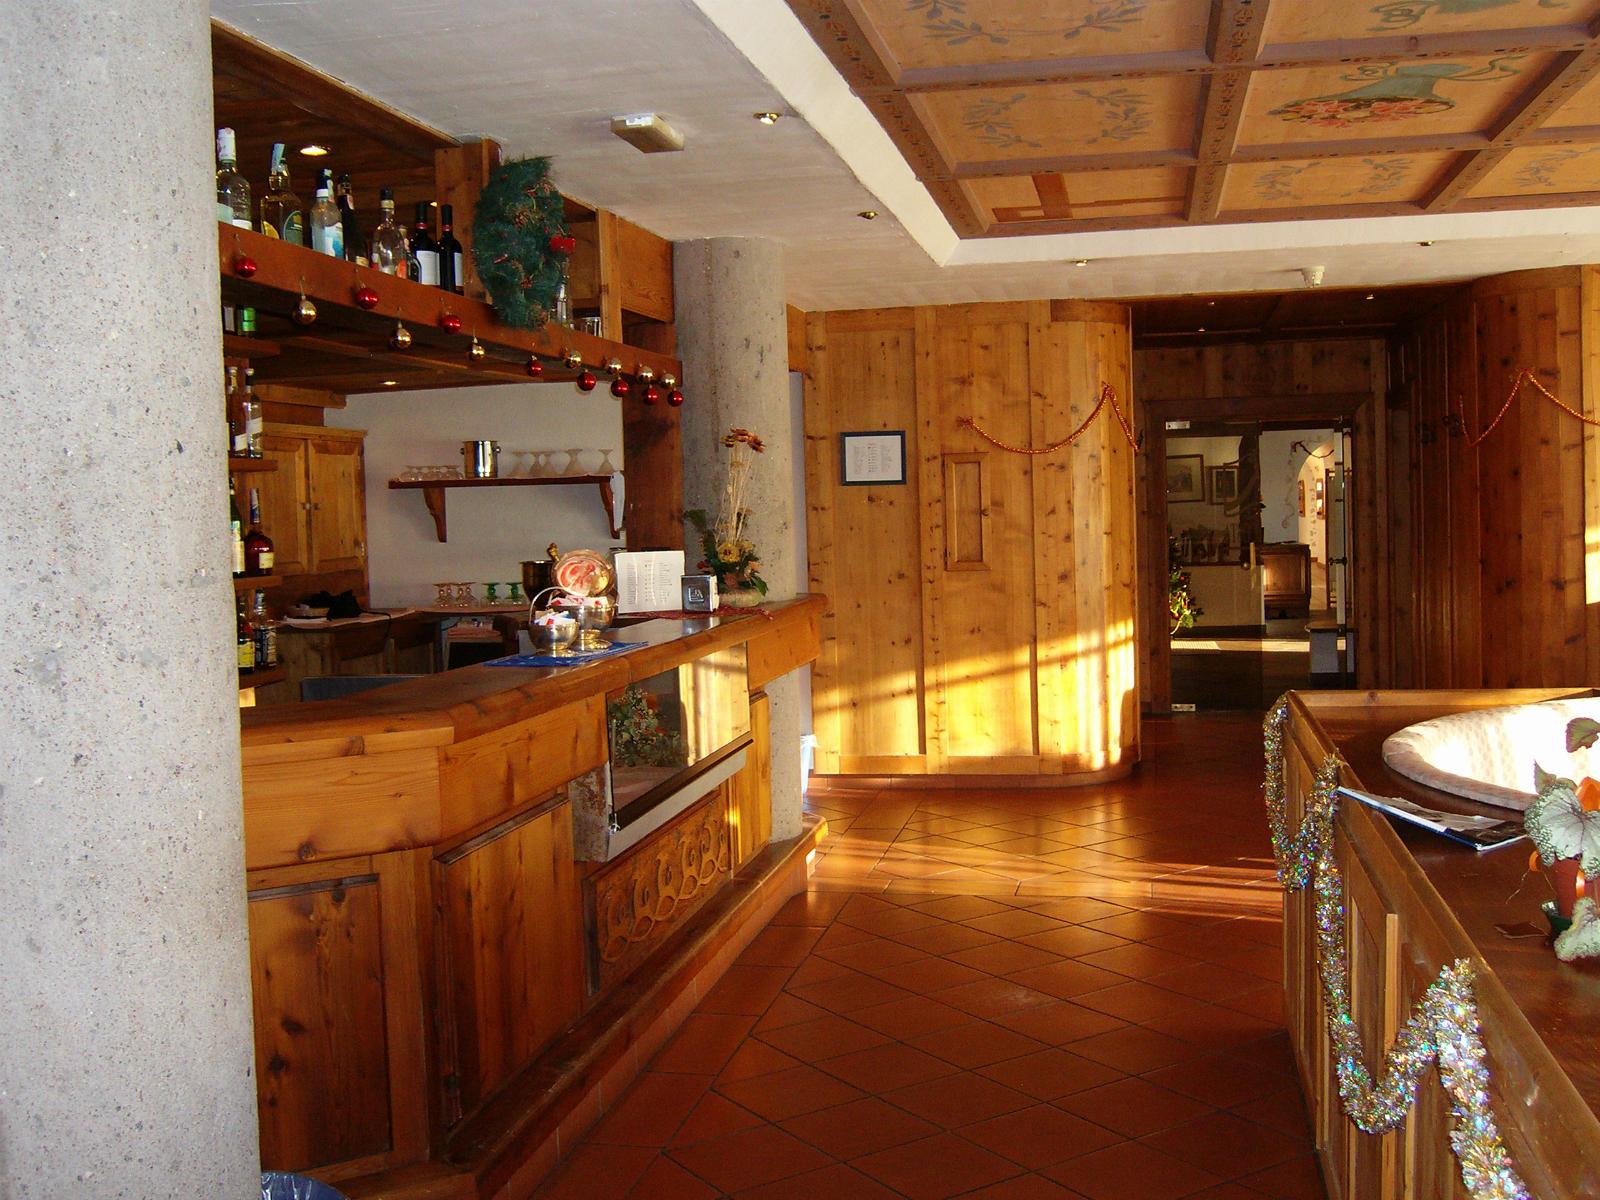 Family Hotel a Cavalese, Hotel Bellacosta, interni